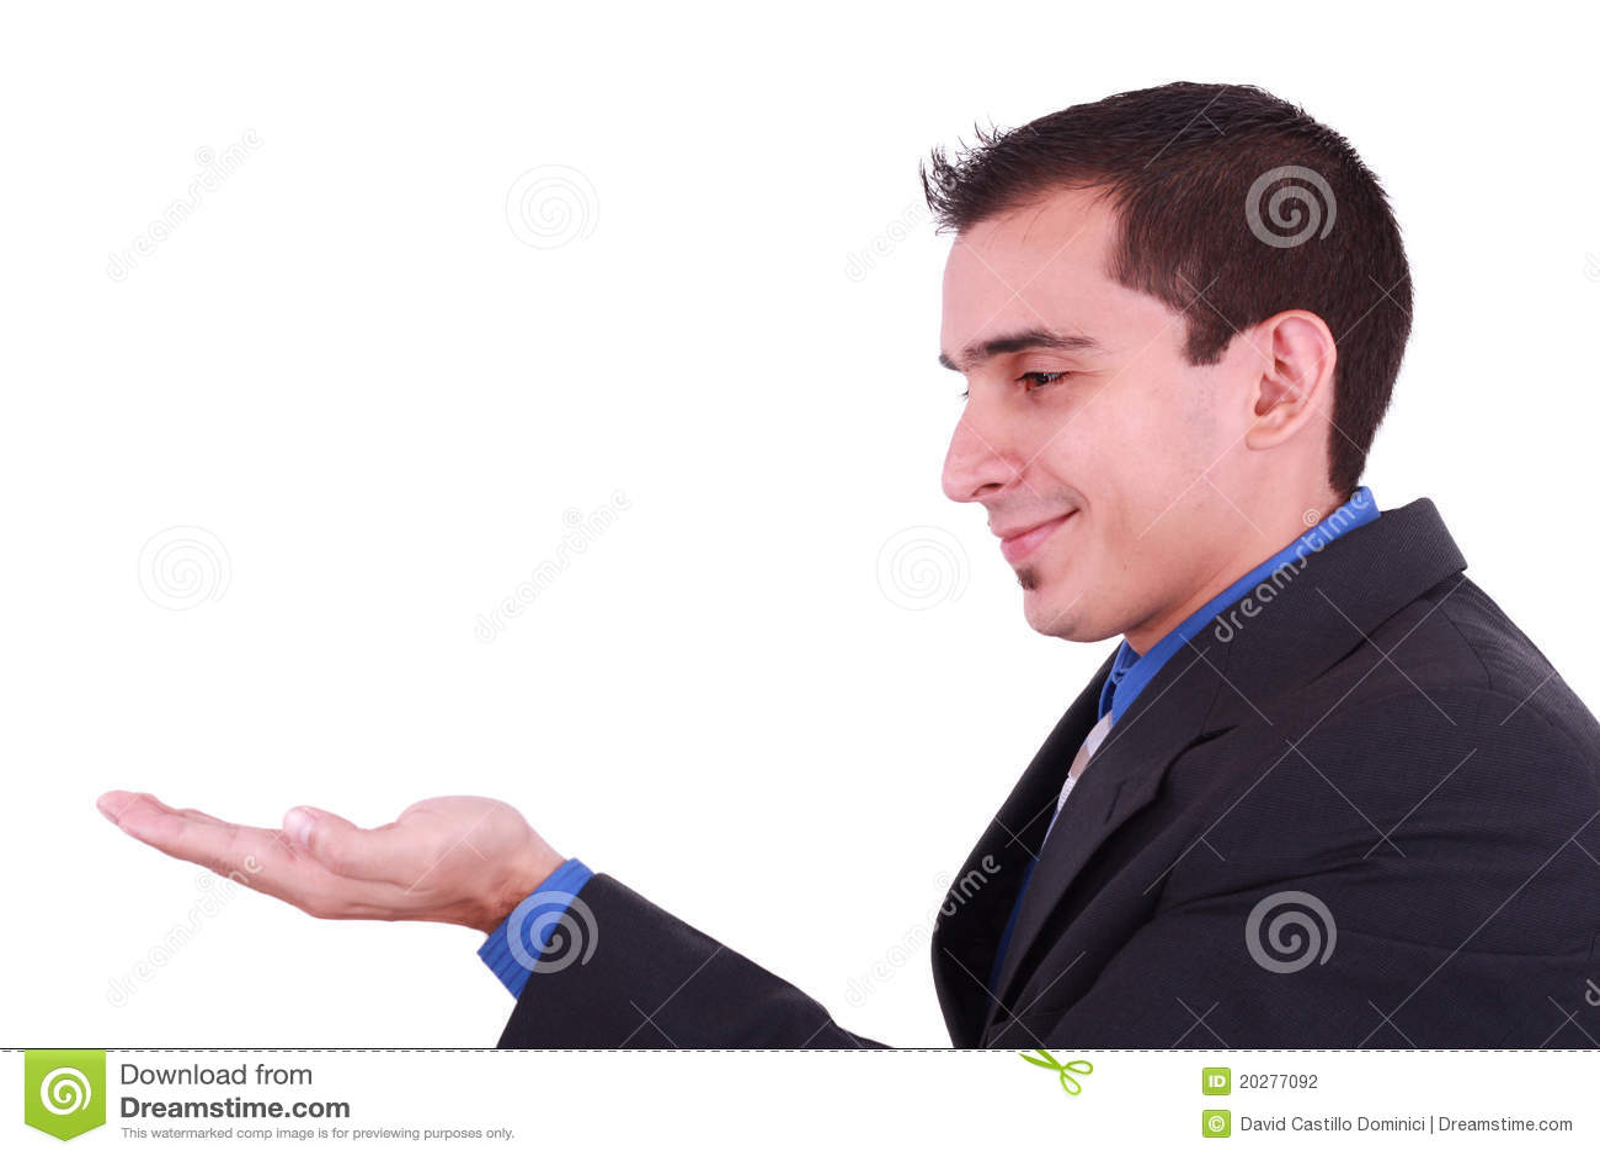 image Assfucking hand his adult girlfriend lesbian